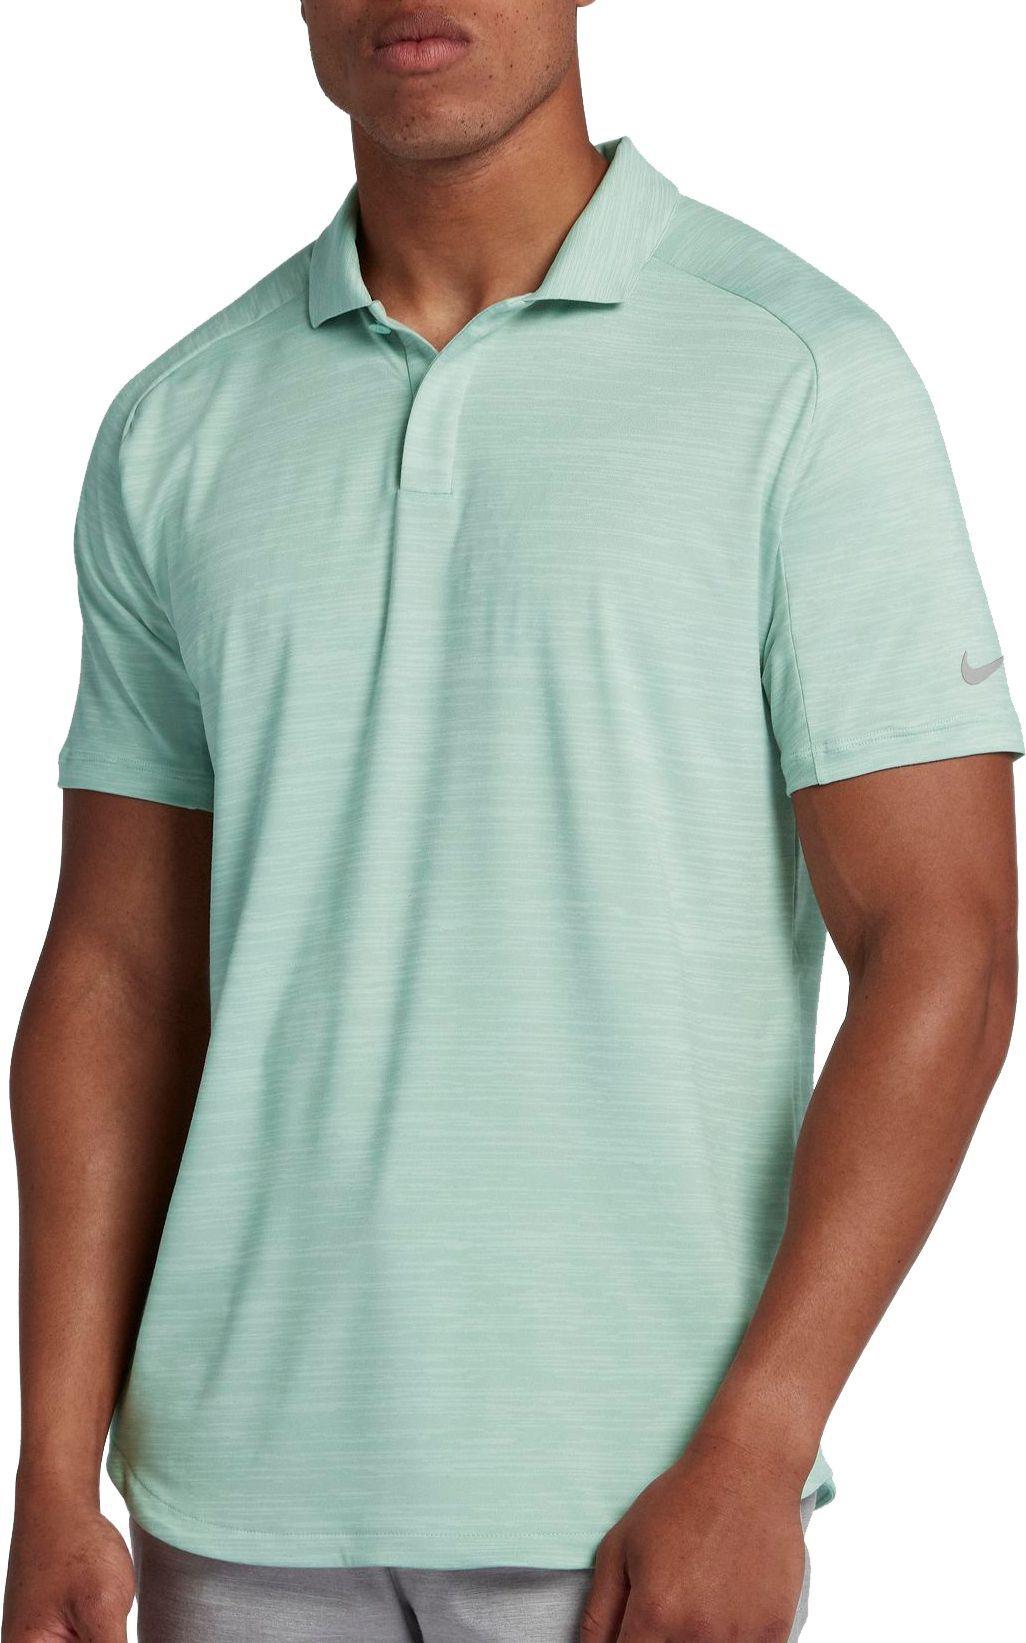 8f8ad37d Nike Men's Heather Raglan Golf Polo in 2019 | Products | Polo, Nike ...